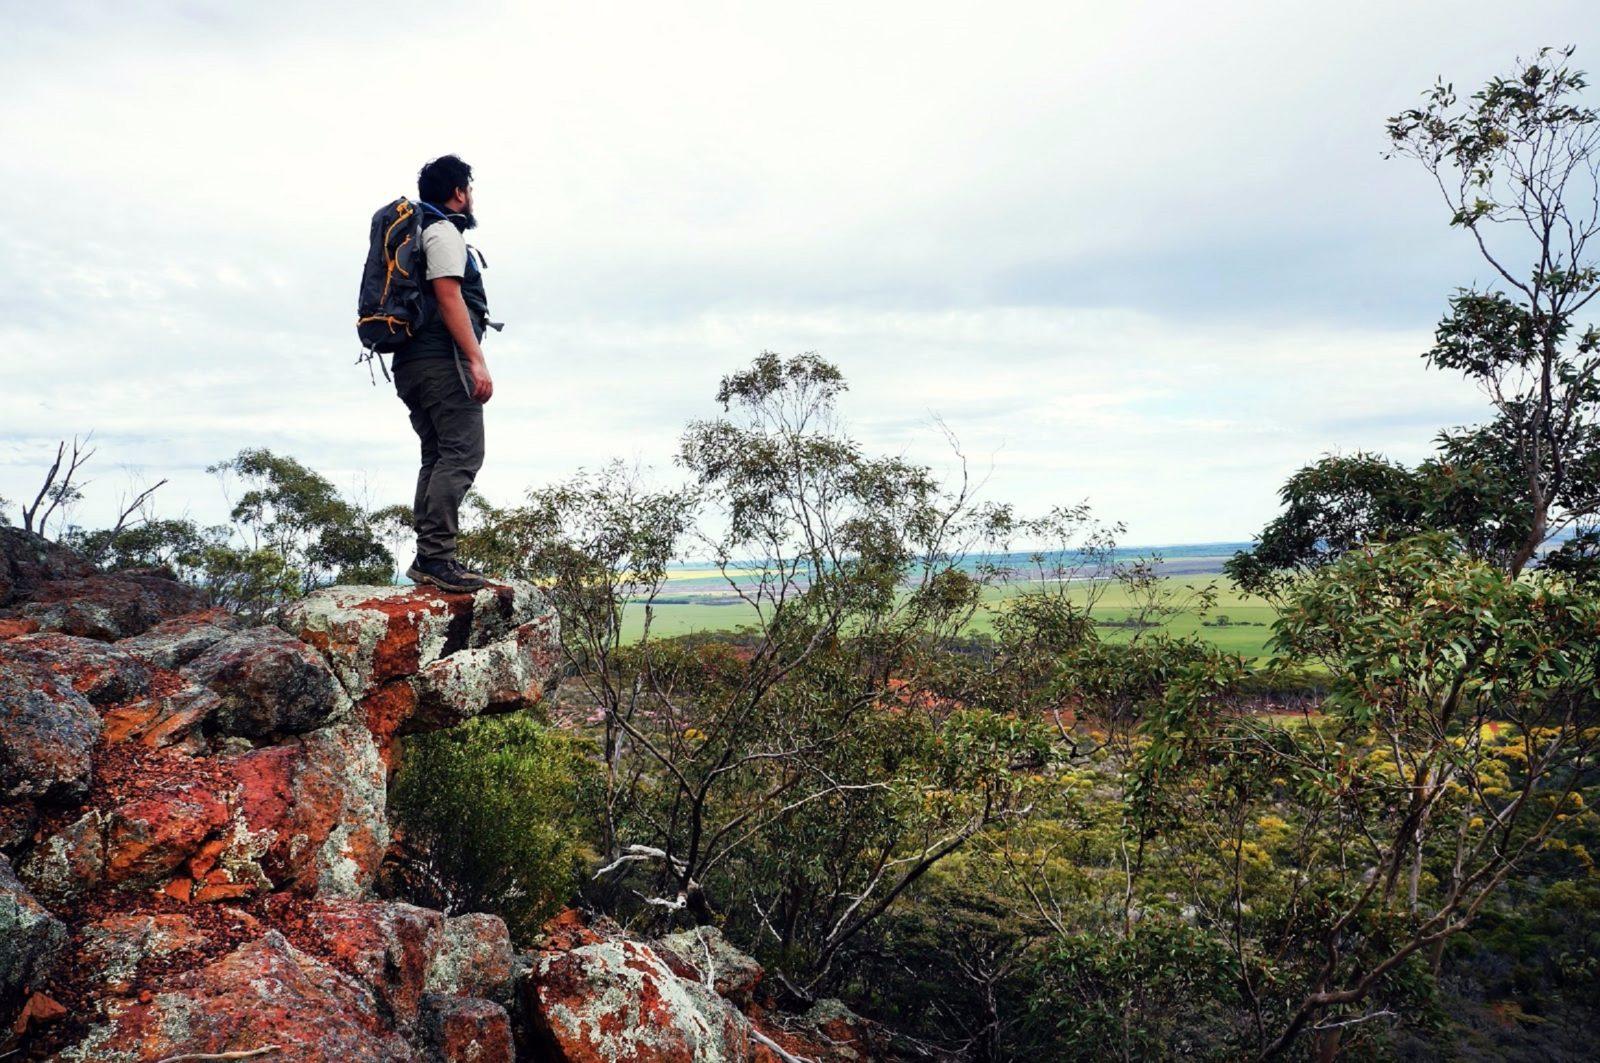 Mount Matilda, Wongan Hills, Western Australia